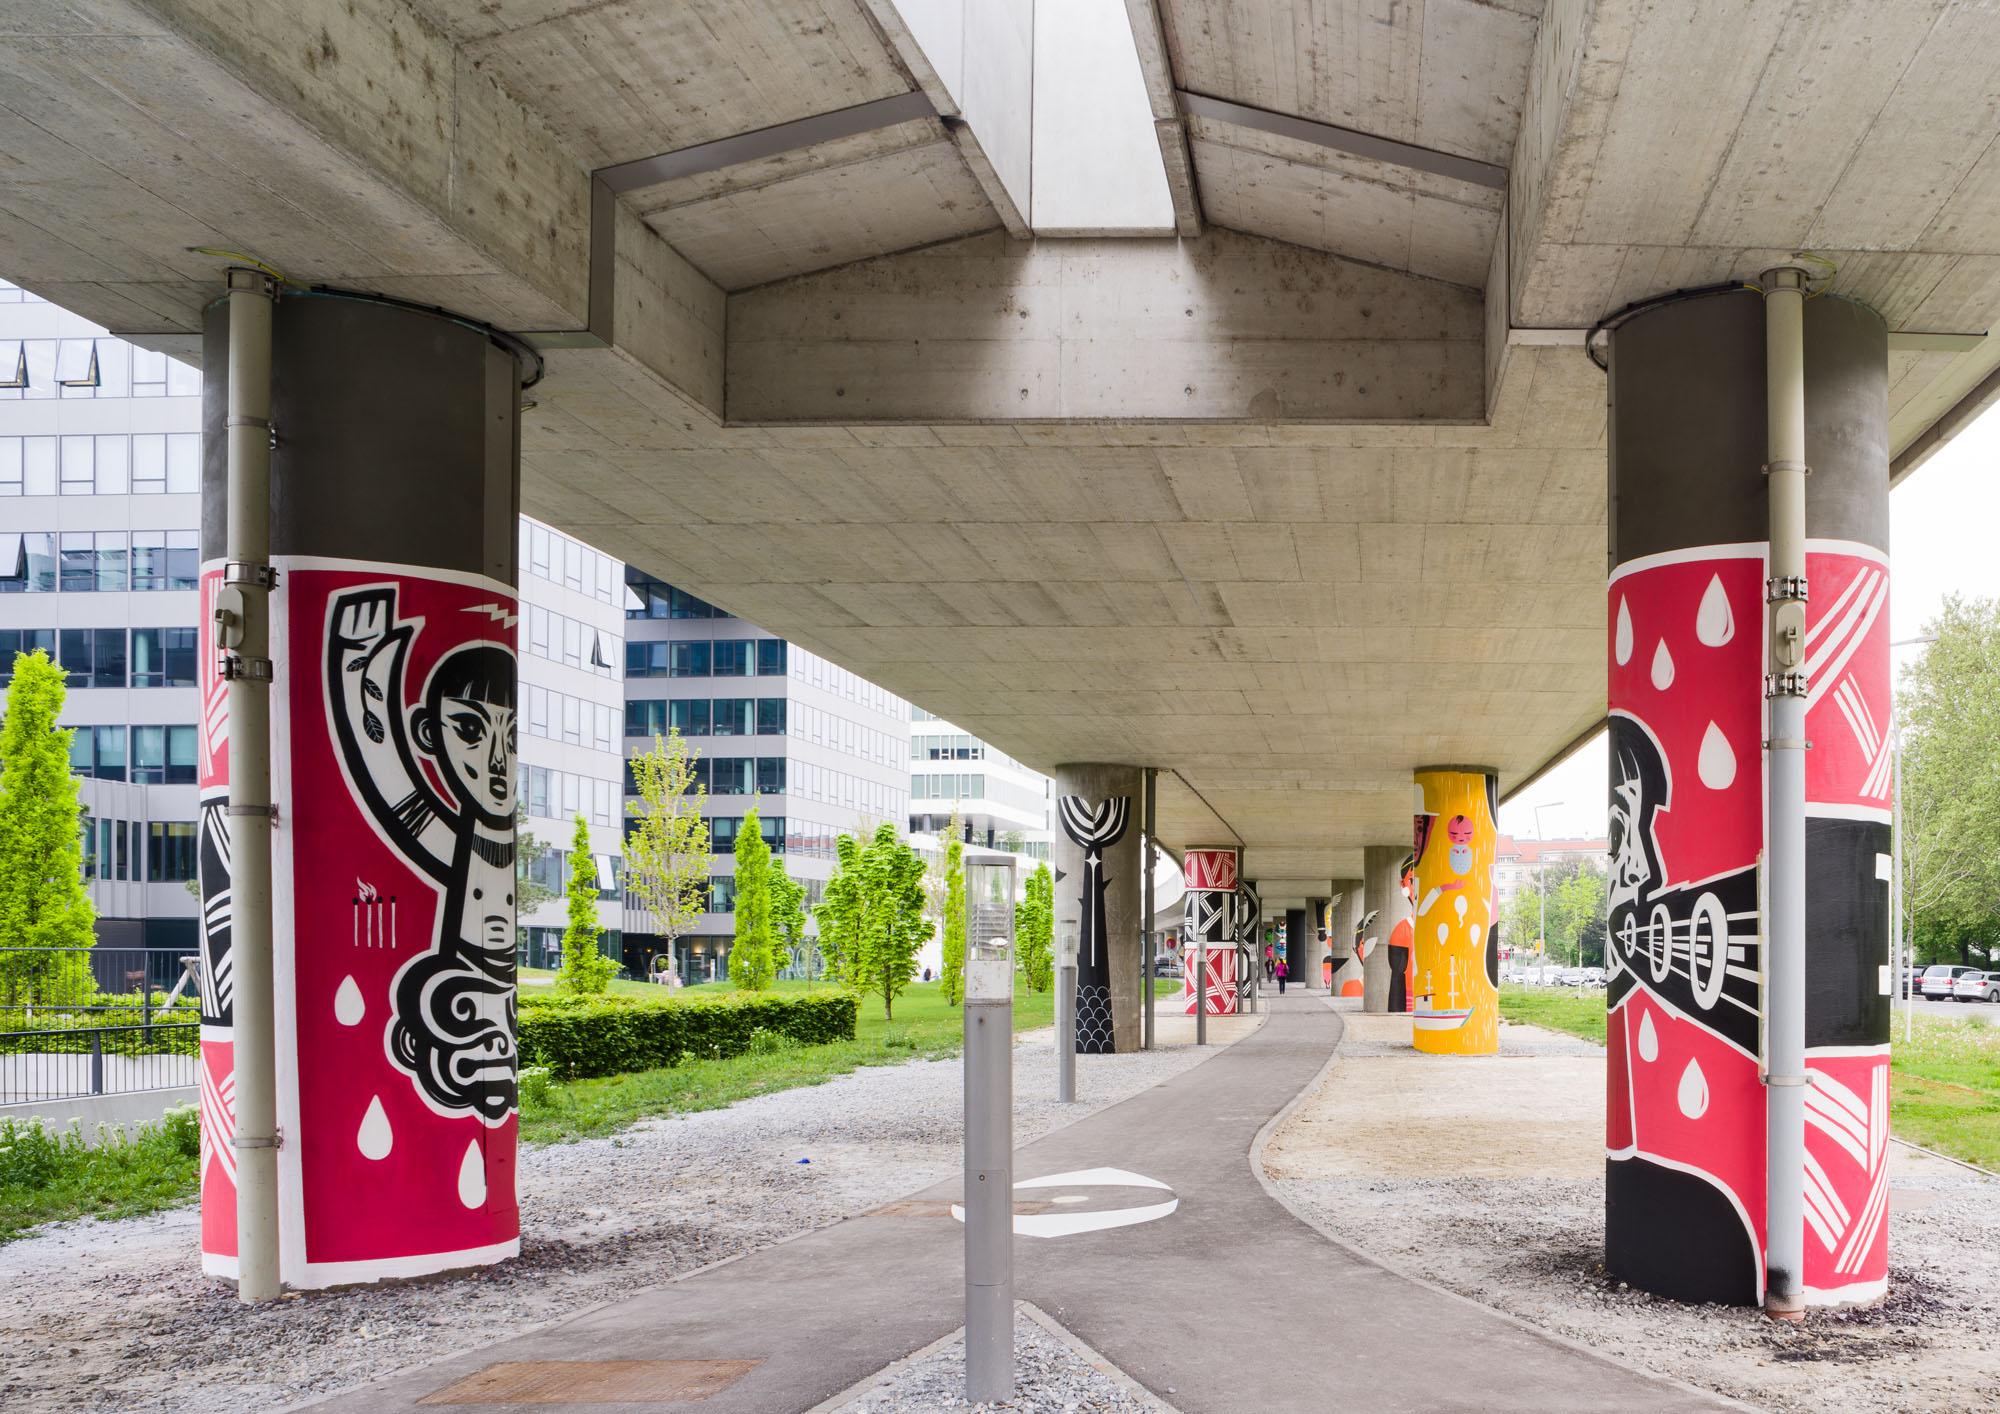 Speto, 3 Brothers. Installation, U2-Station Krieau, Wien © Inoperable Gallery